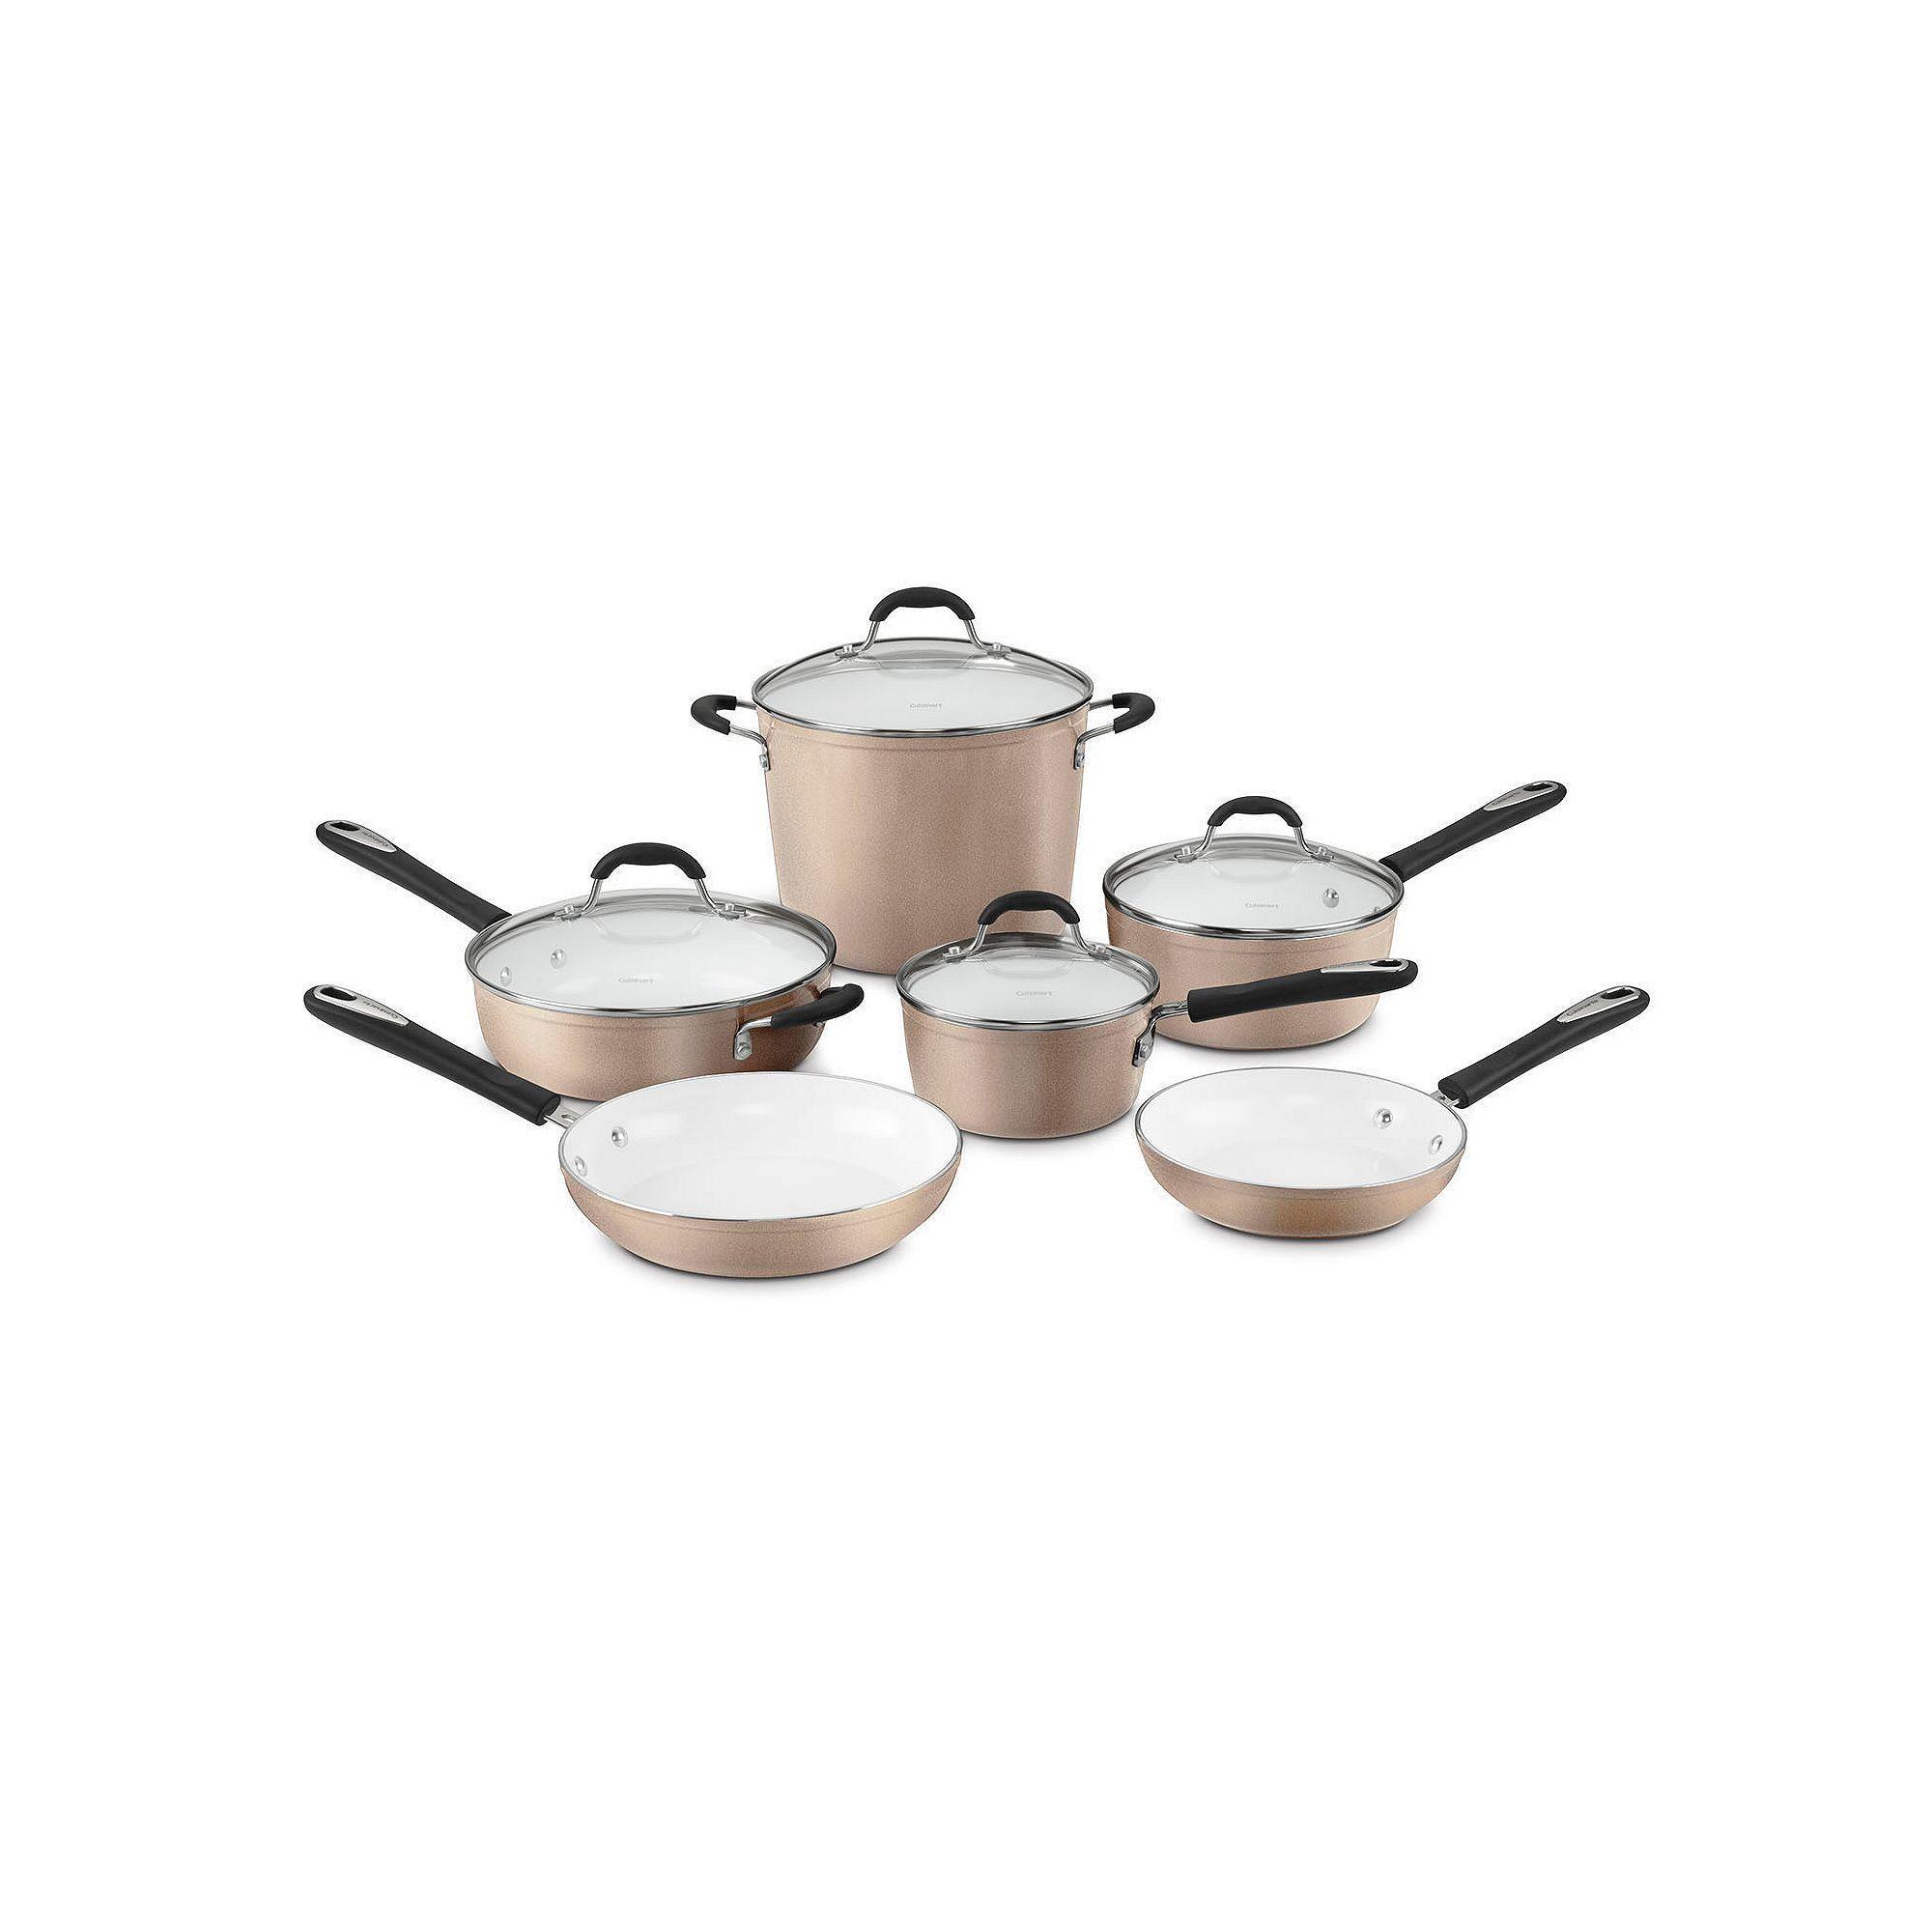 Cuisinart Elements 10 Pc Non Stick Ceramic Cookware Set Products Cookware Set Cookware Cuisinart Cookware